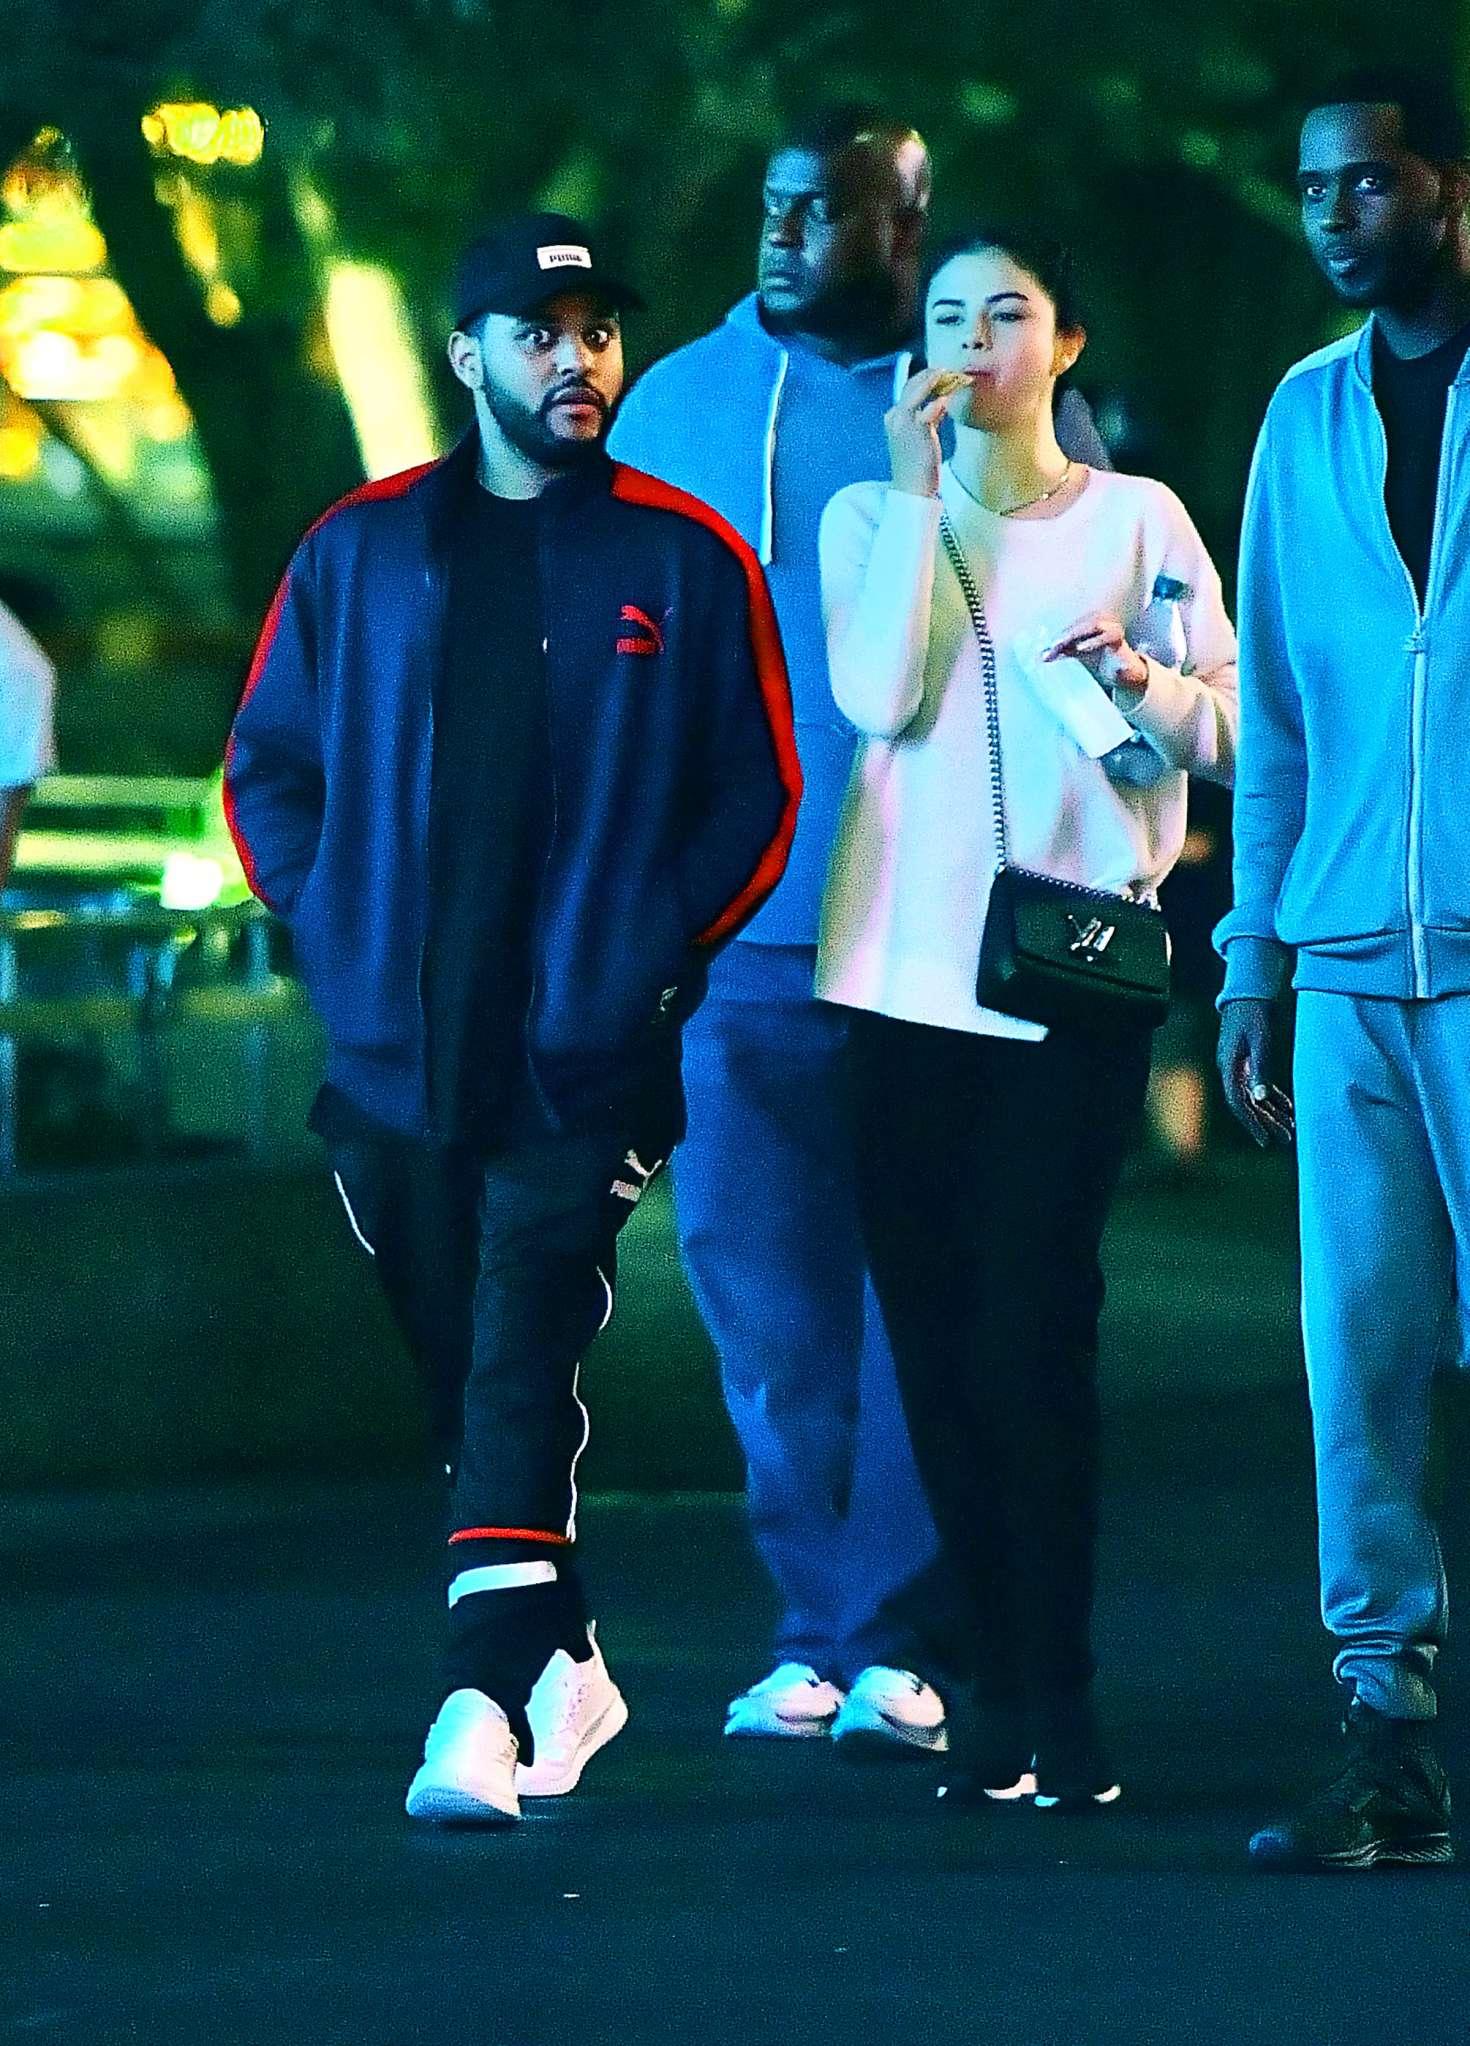 Selena Gomez 2017 : Selena Gomez and The Weeknd at Disneyland -03